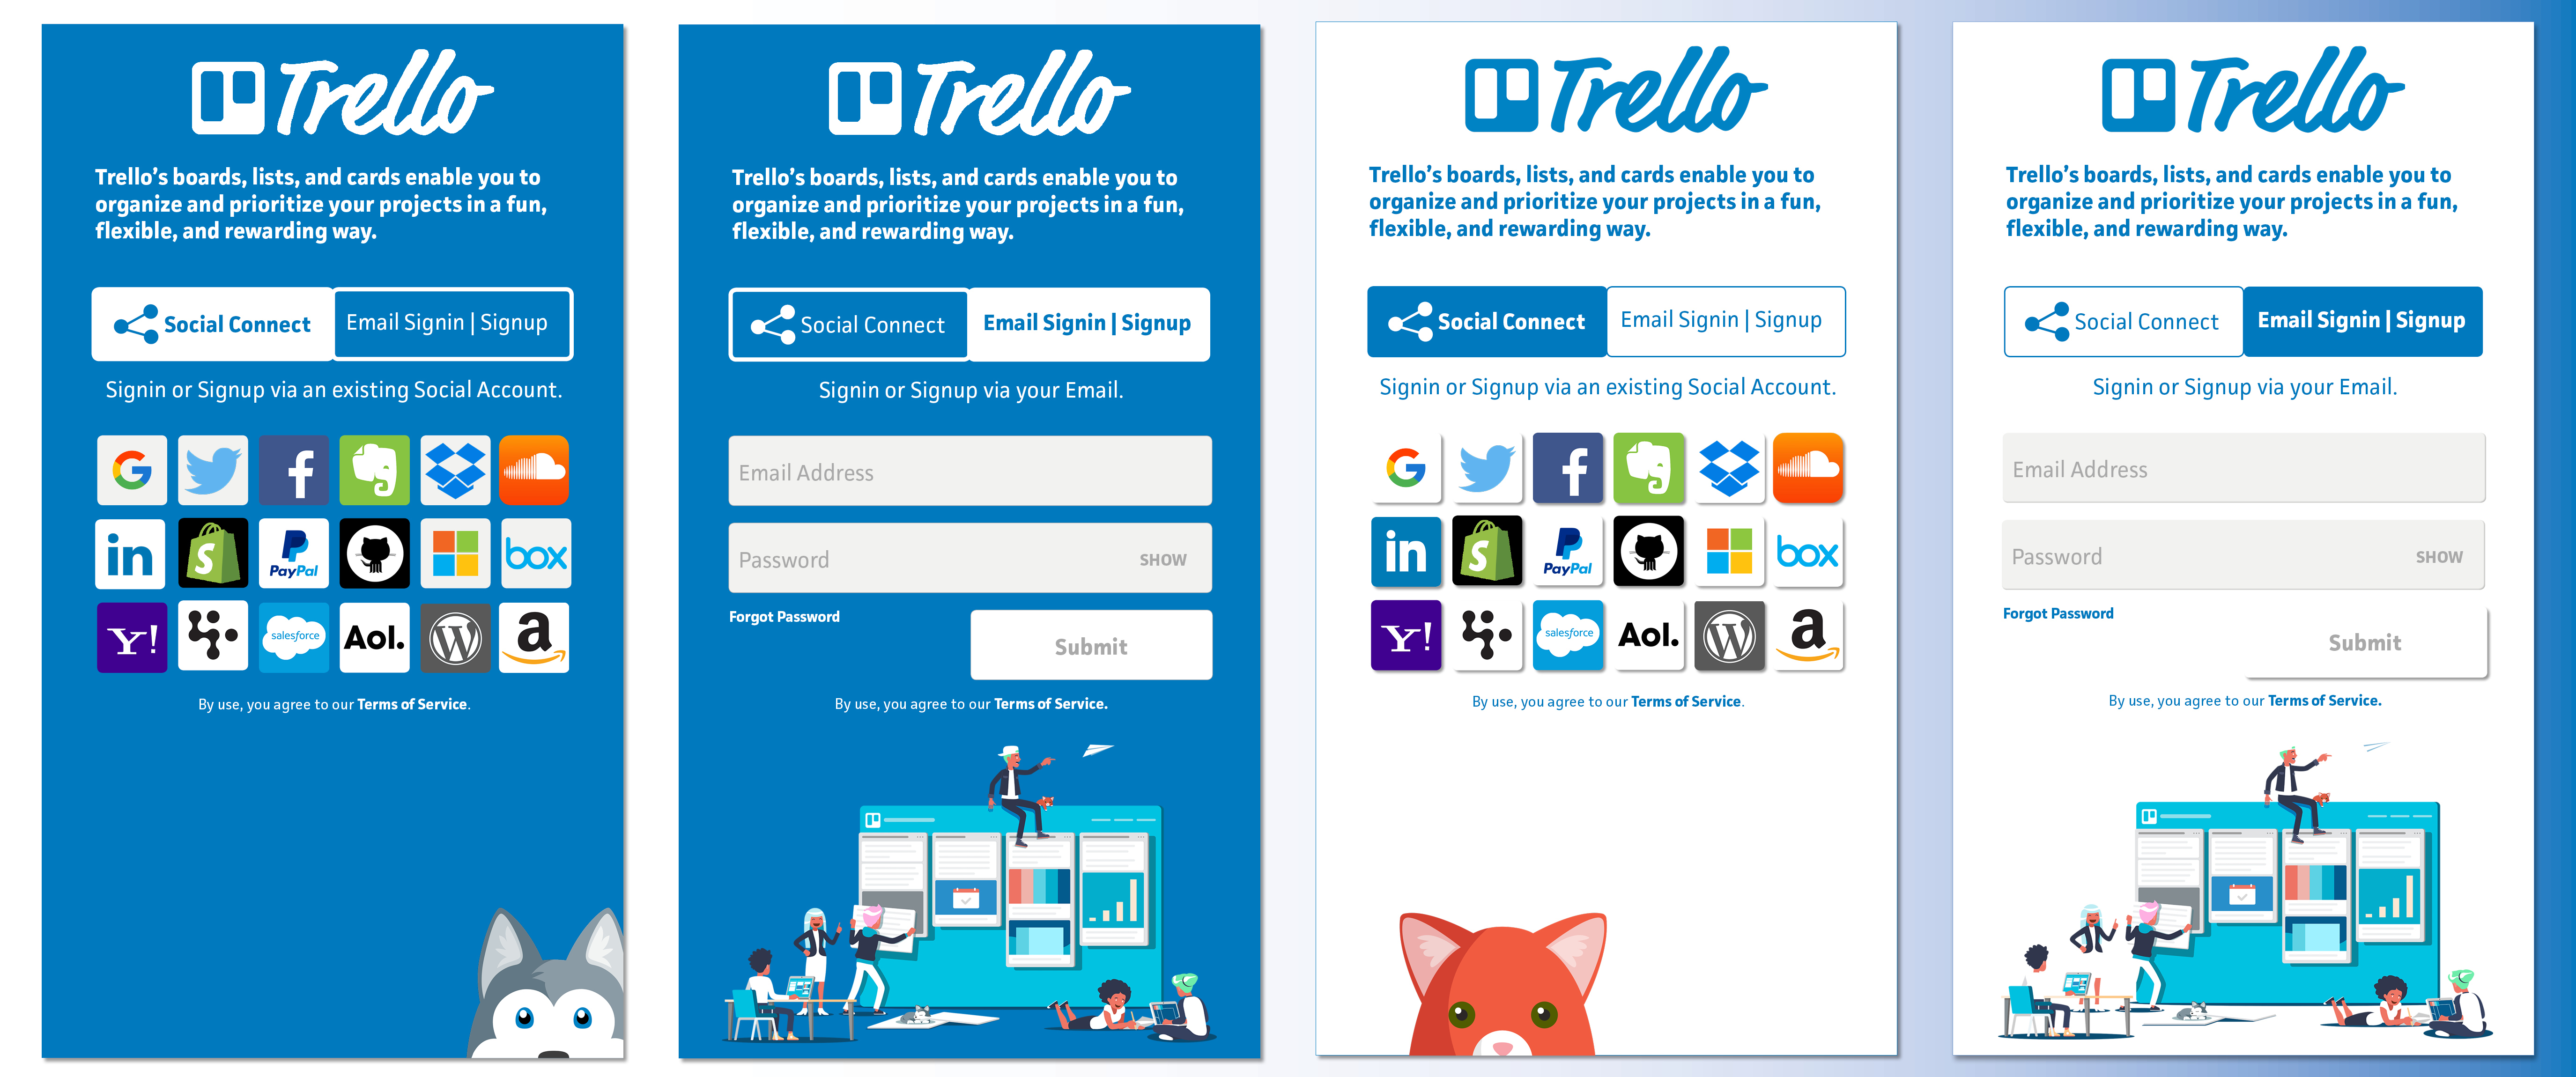 Trello Login Screens | AngelList